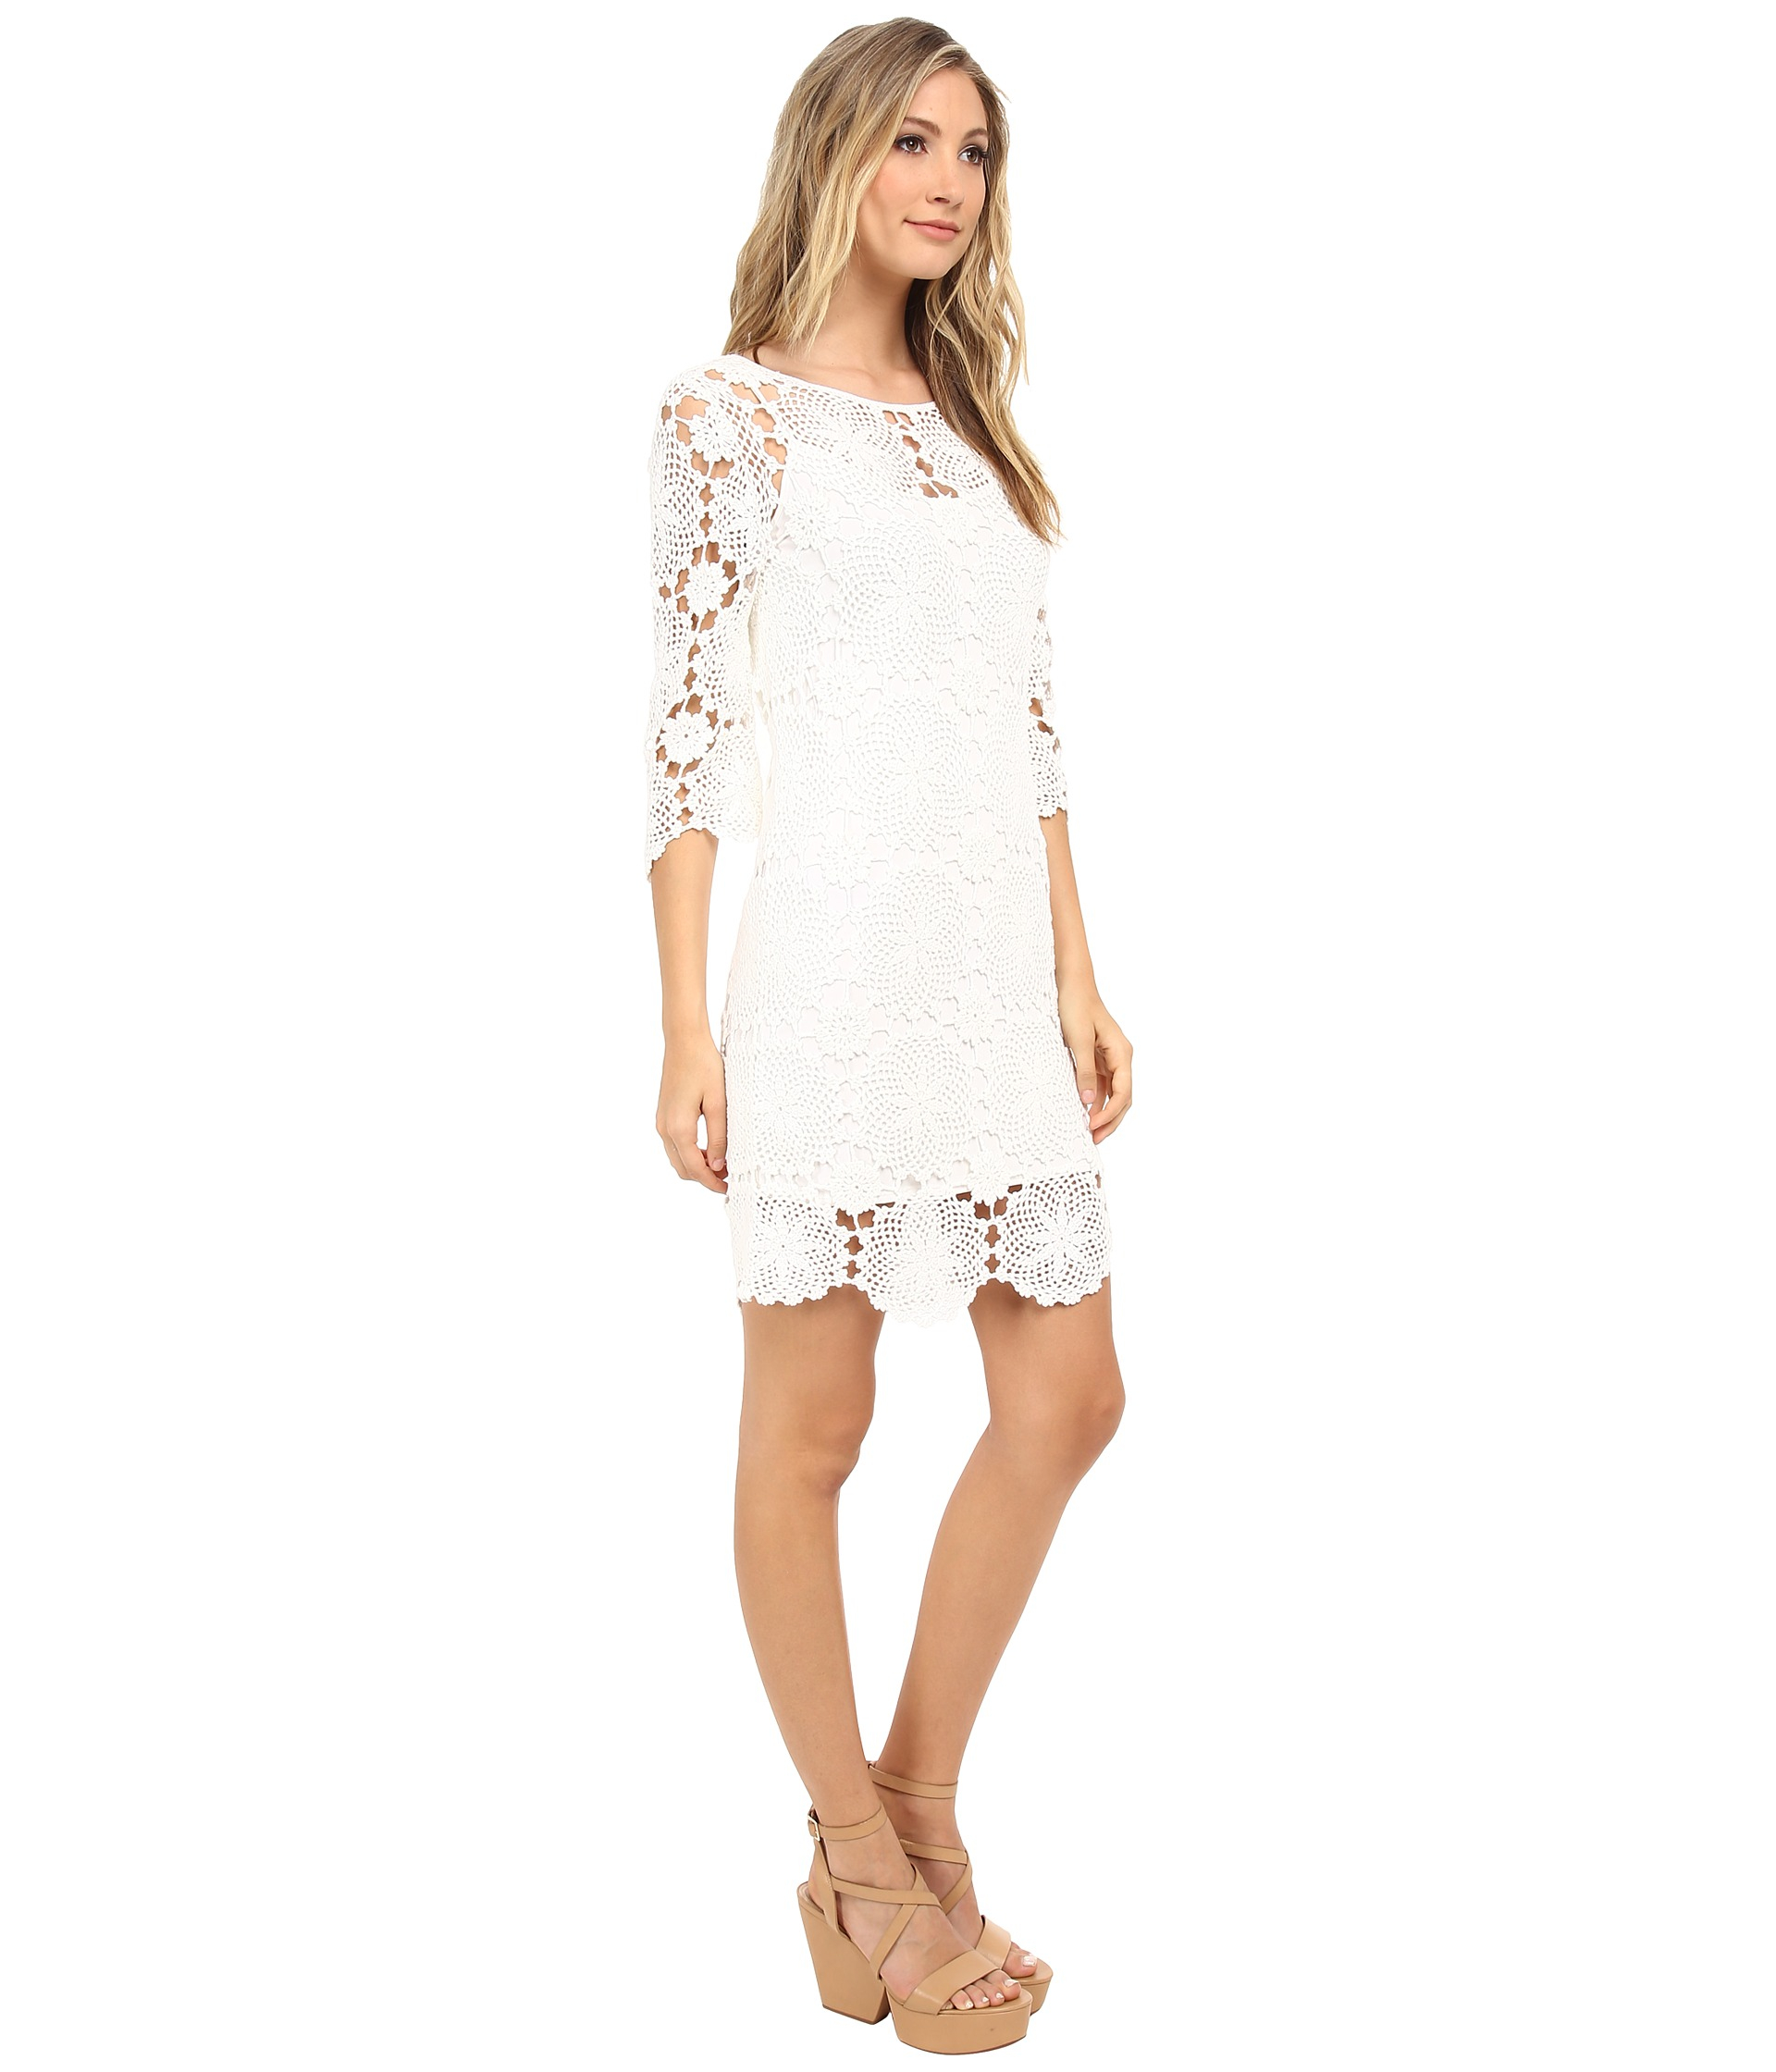 f3c41a10d71 Lyst - Trina Turk Summertime Dress in White